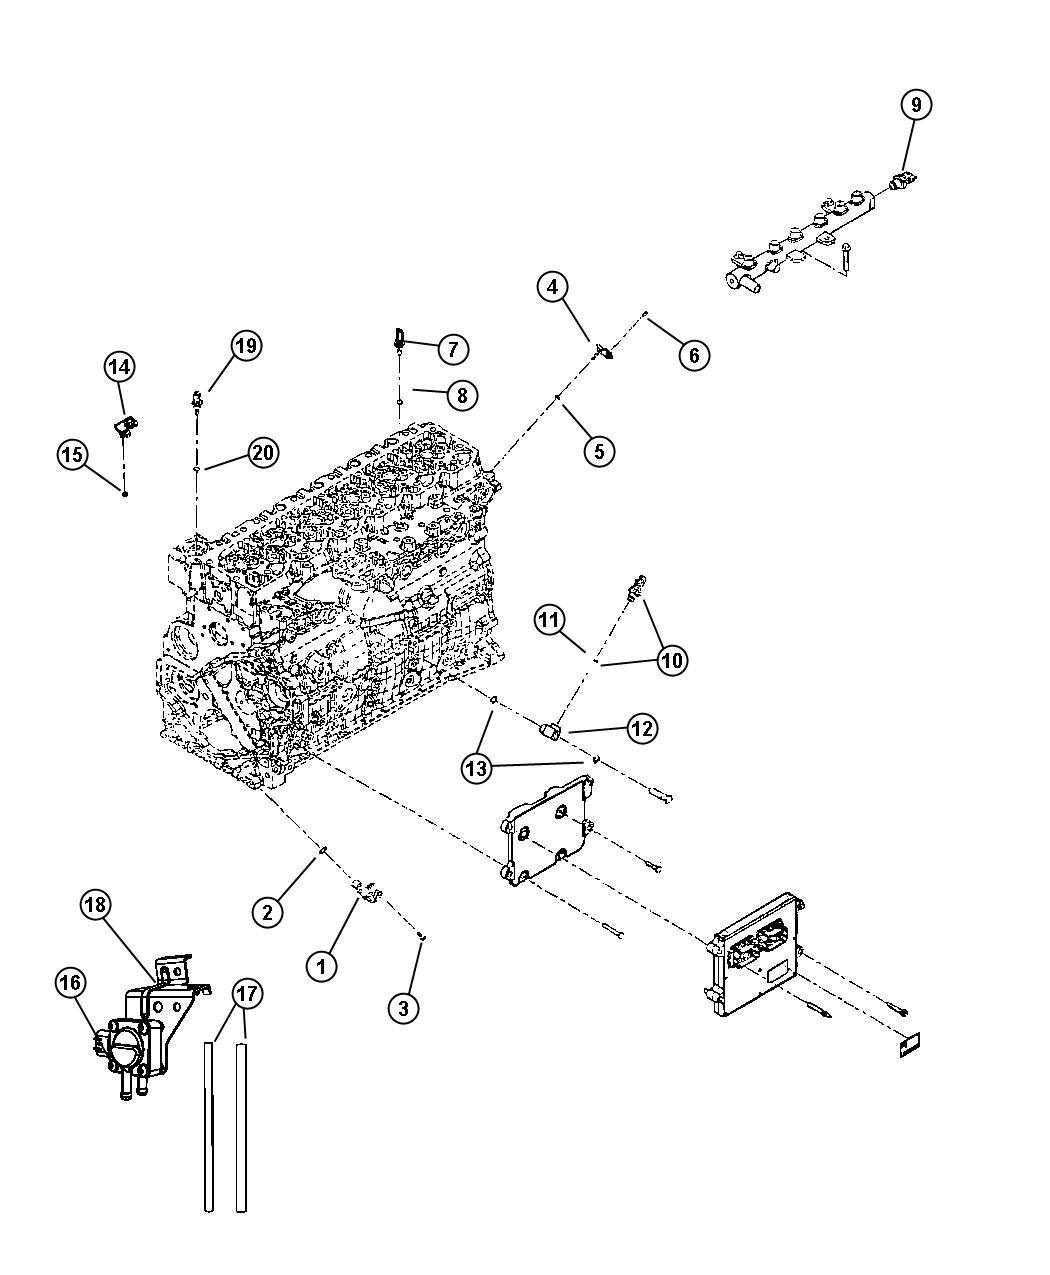 2002 chrysler concorde map sensor